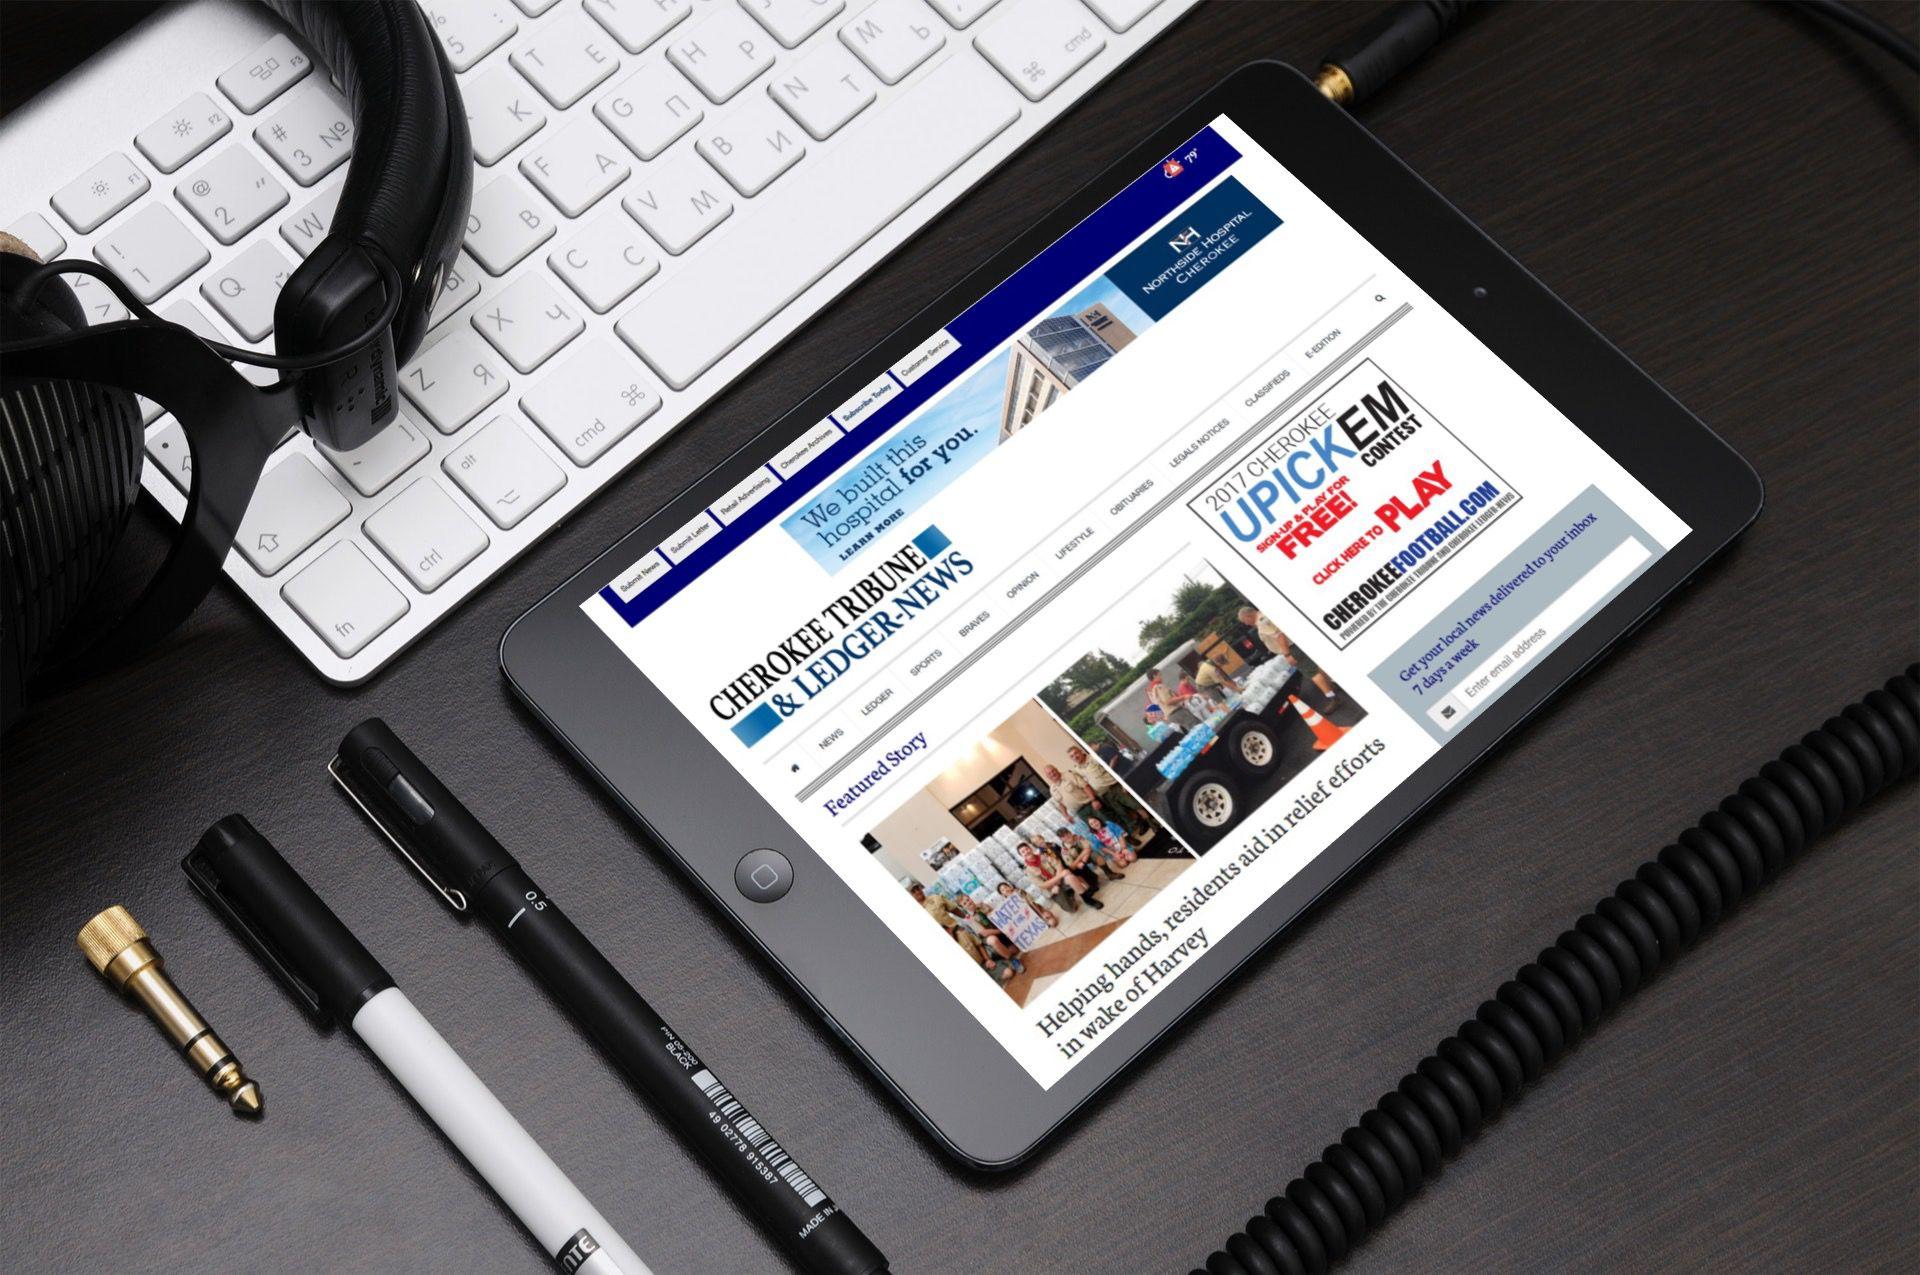 tribuneledgernews com powered by the cherokee tribune and ledger